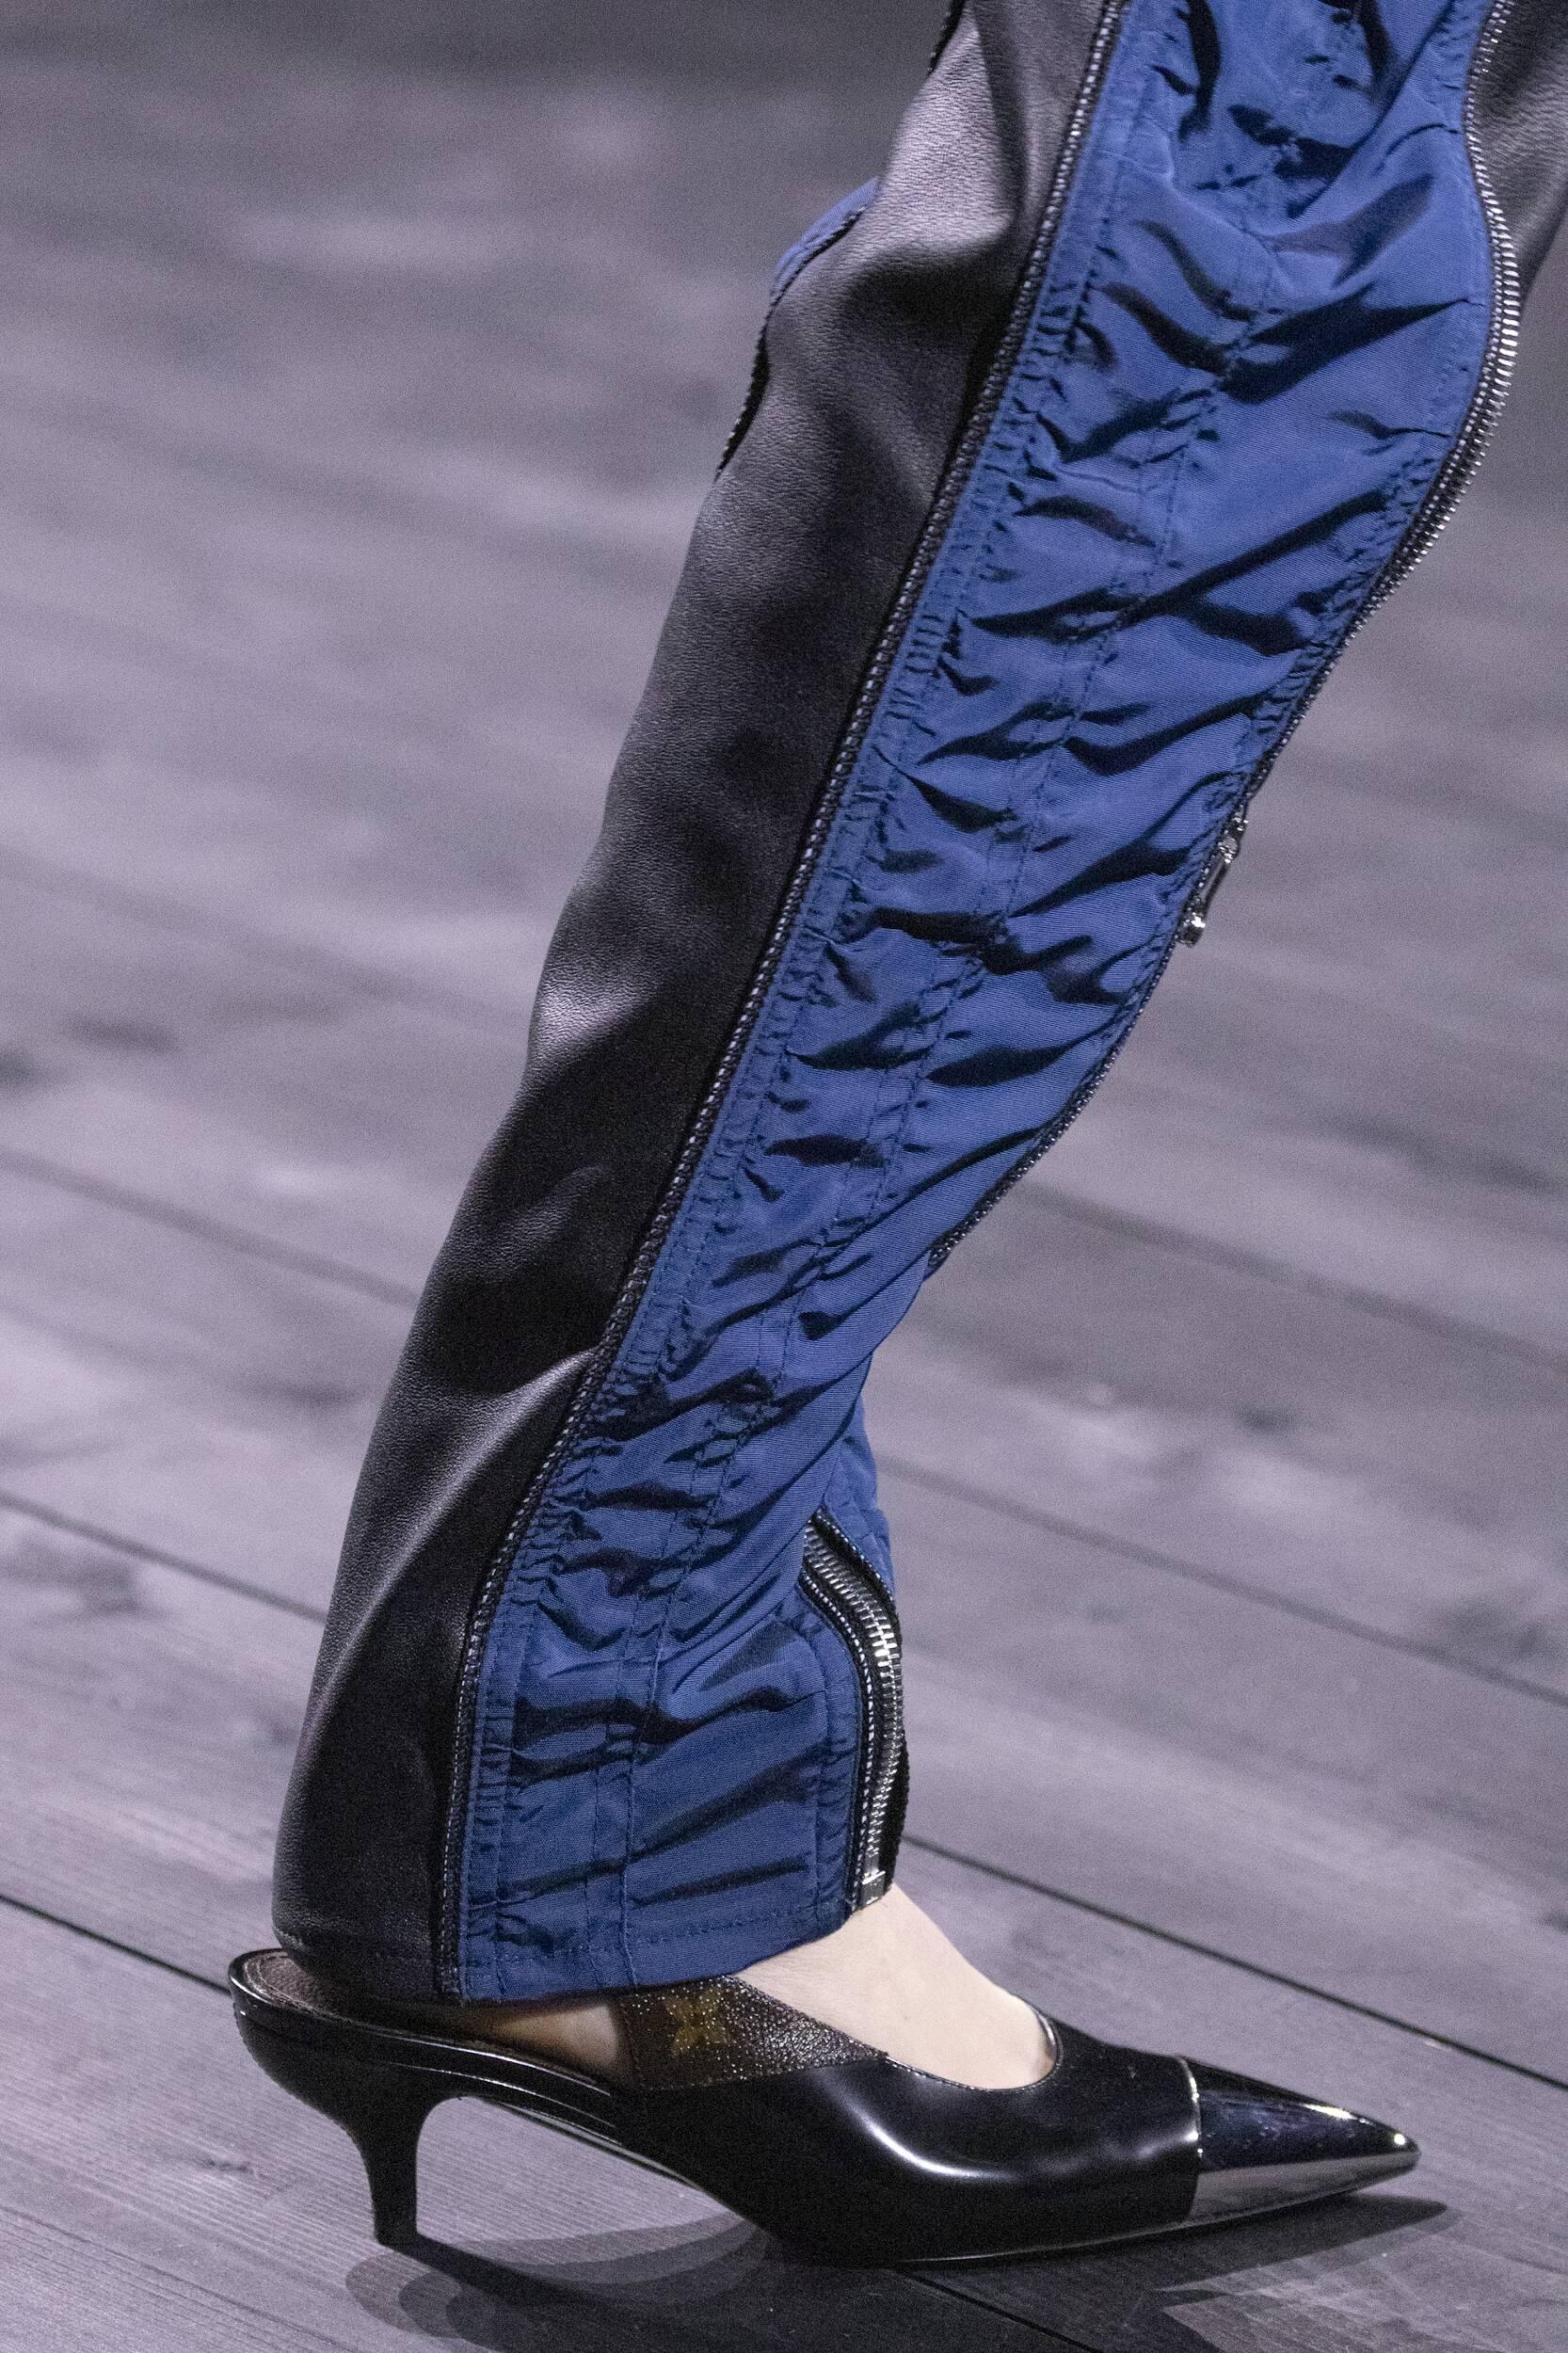 Shoes Louis Vuitton Fashion Show 2020